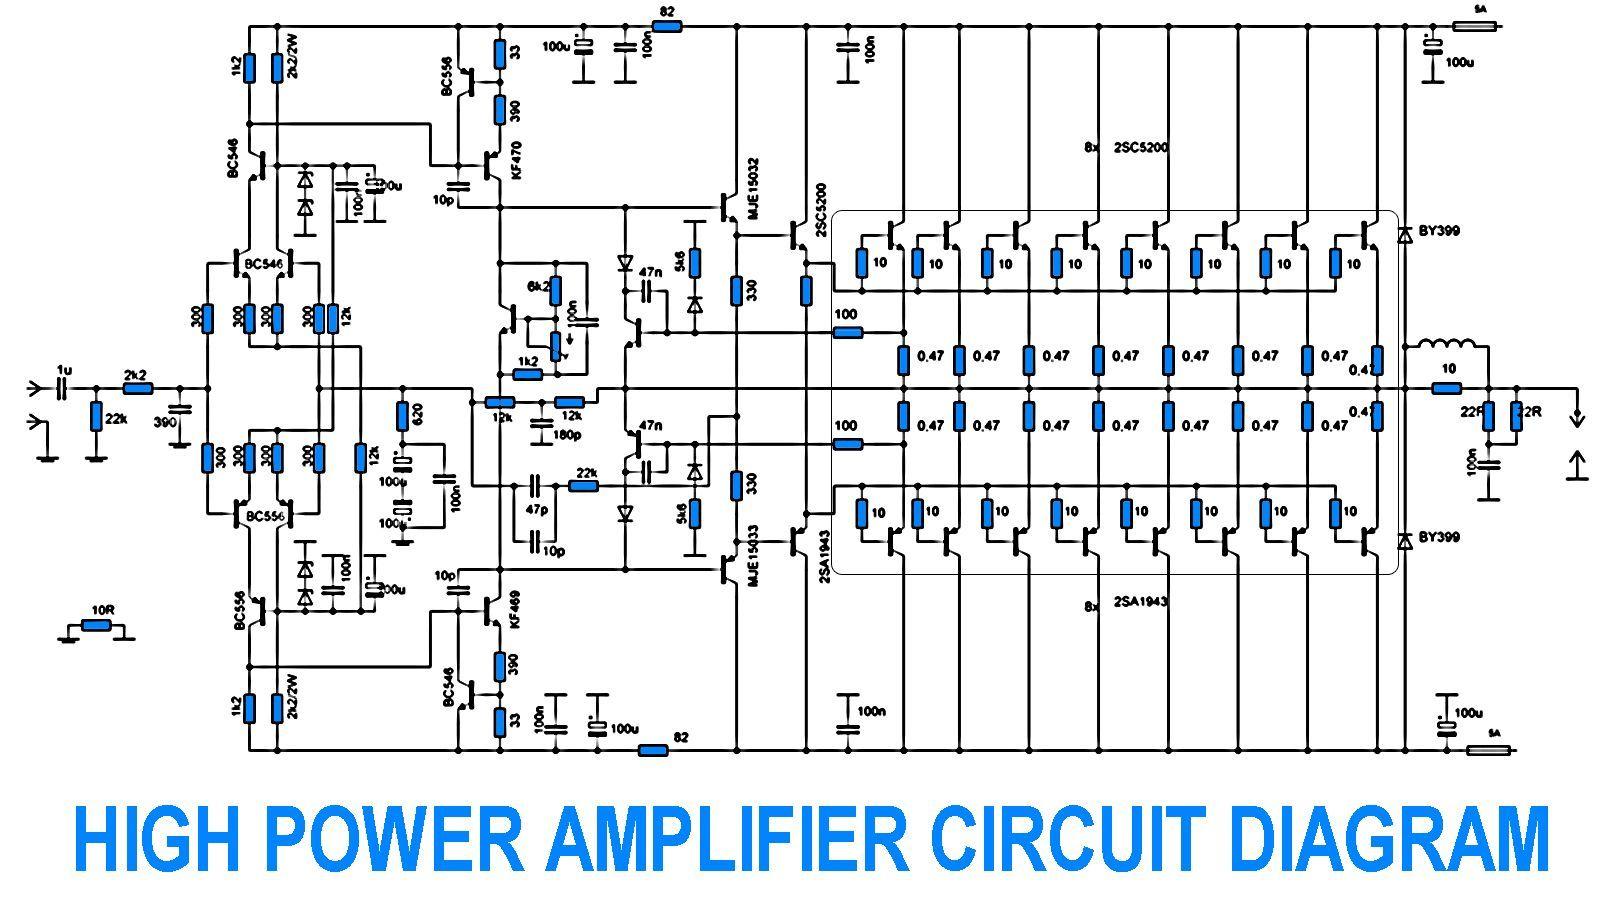 high power amplifier circuit diagram circuit schematic electronics power amplifier with high power amplifier [ 1600 x 905 Pixel ]